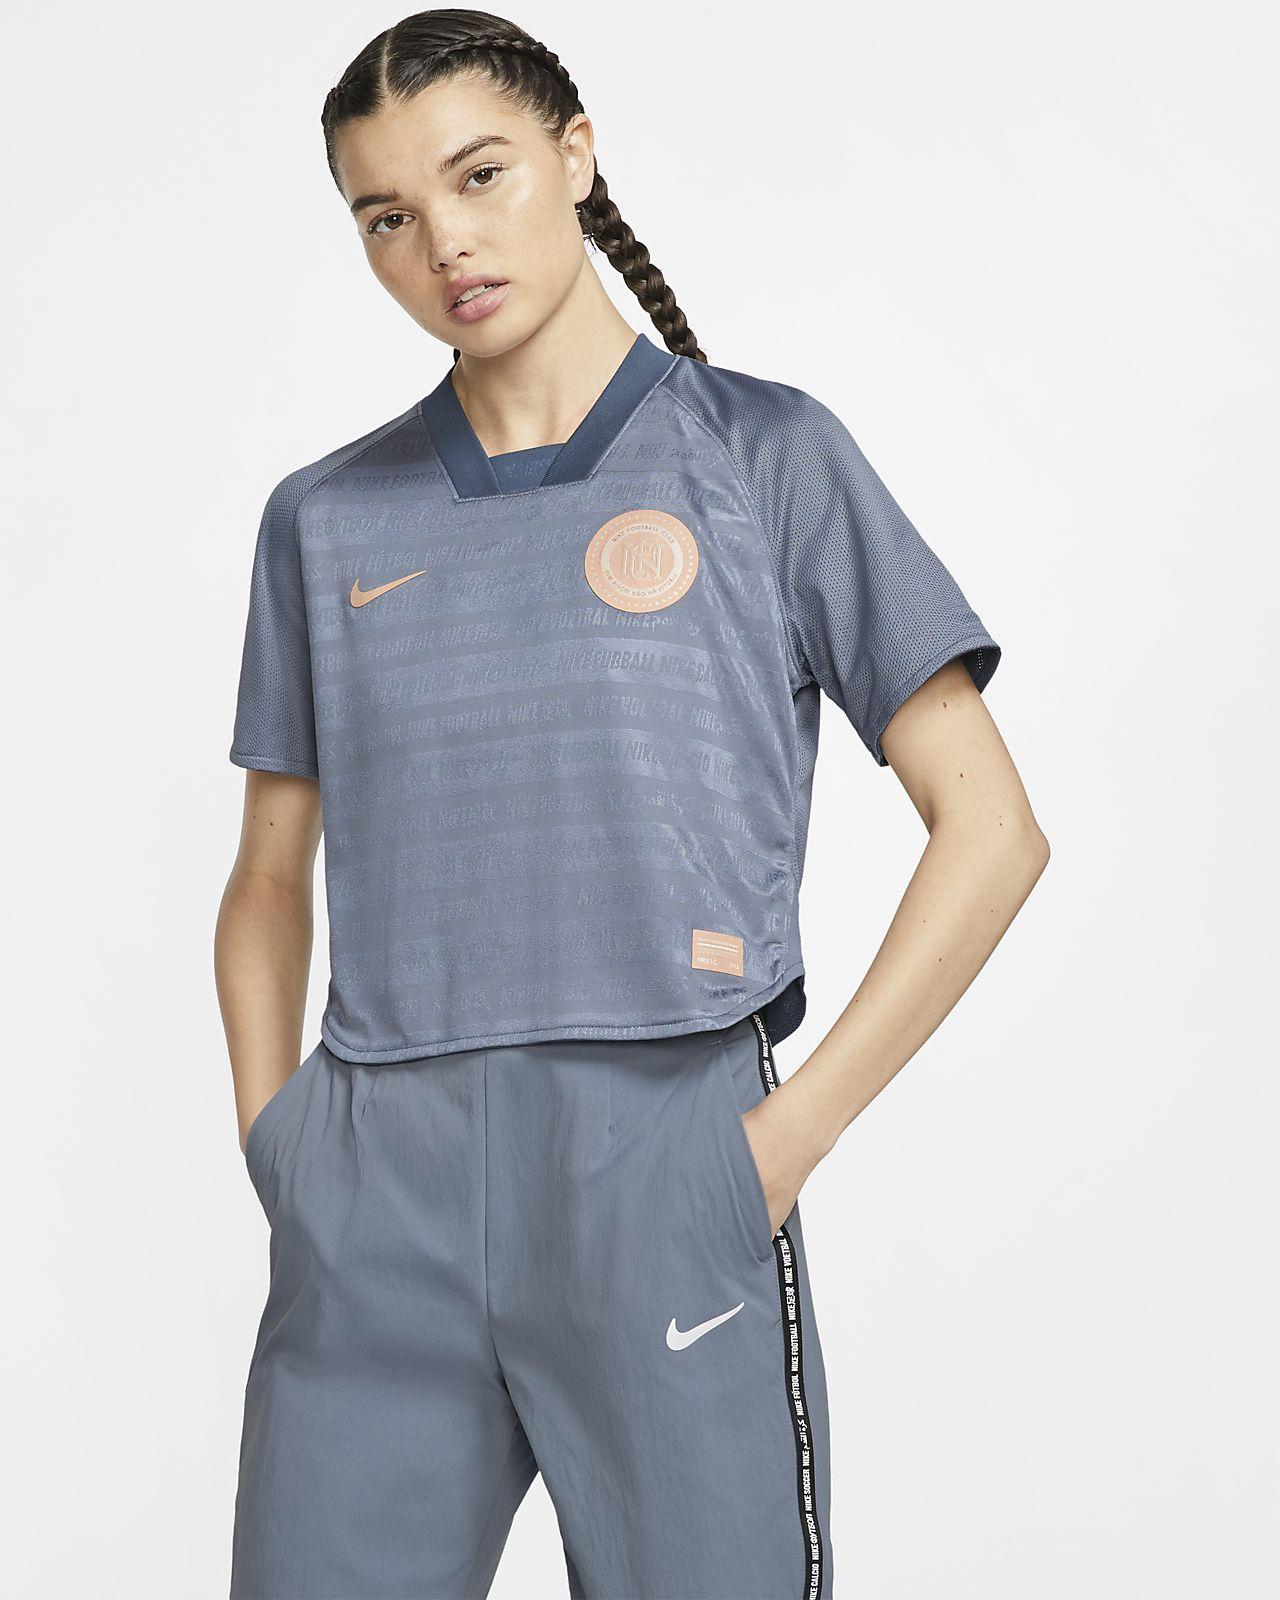 Kortärmad fotbollströja Nike F.C. Dri-FIT för kvinnor